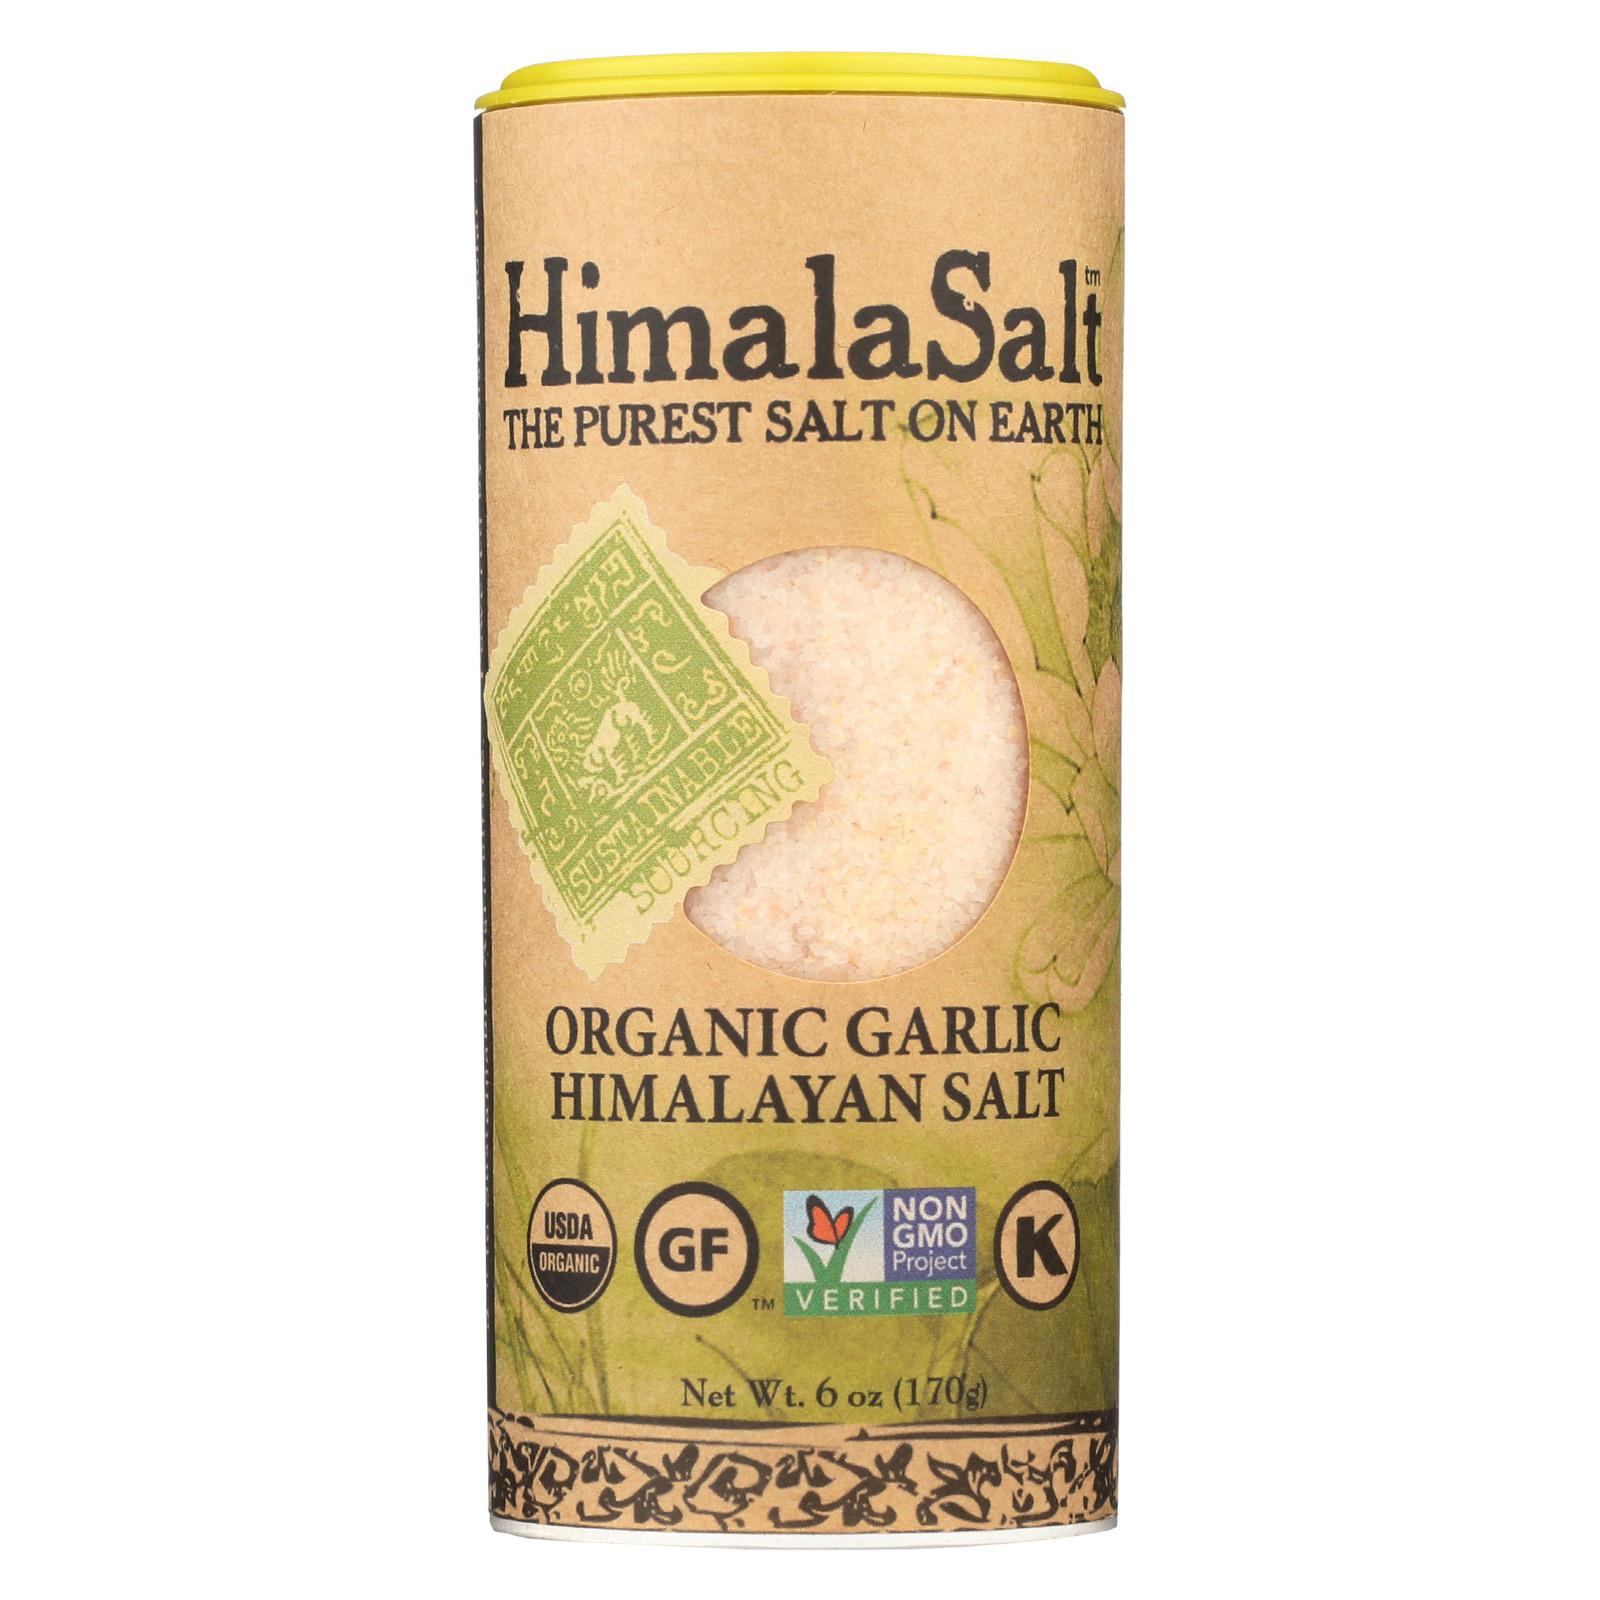 Himalasalt Organic Garlic Salt Shaker - Case of 6 - 6 oz